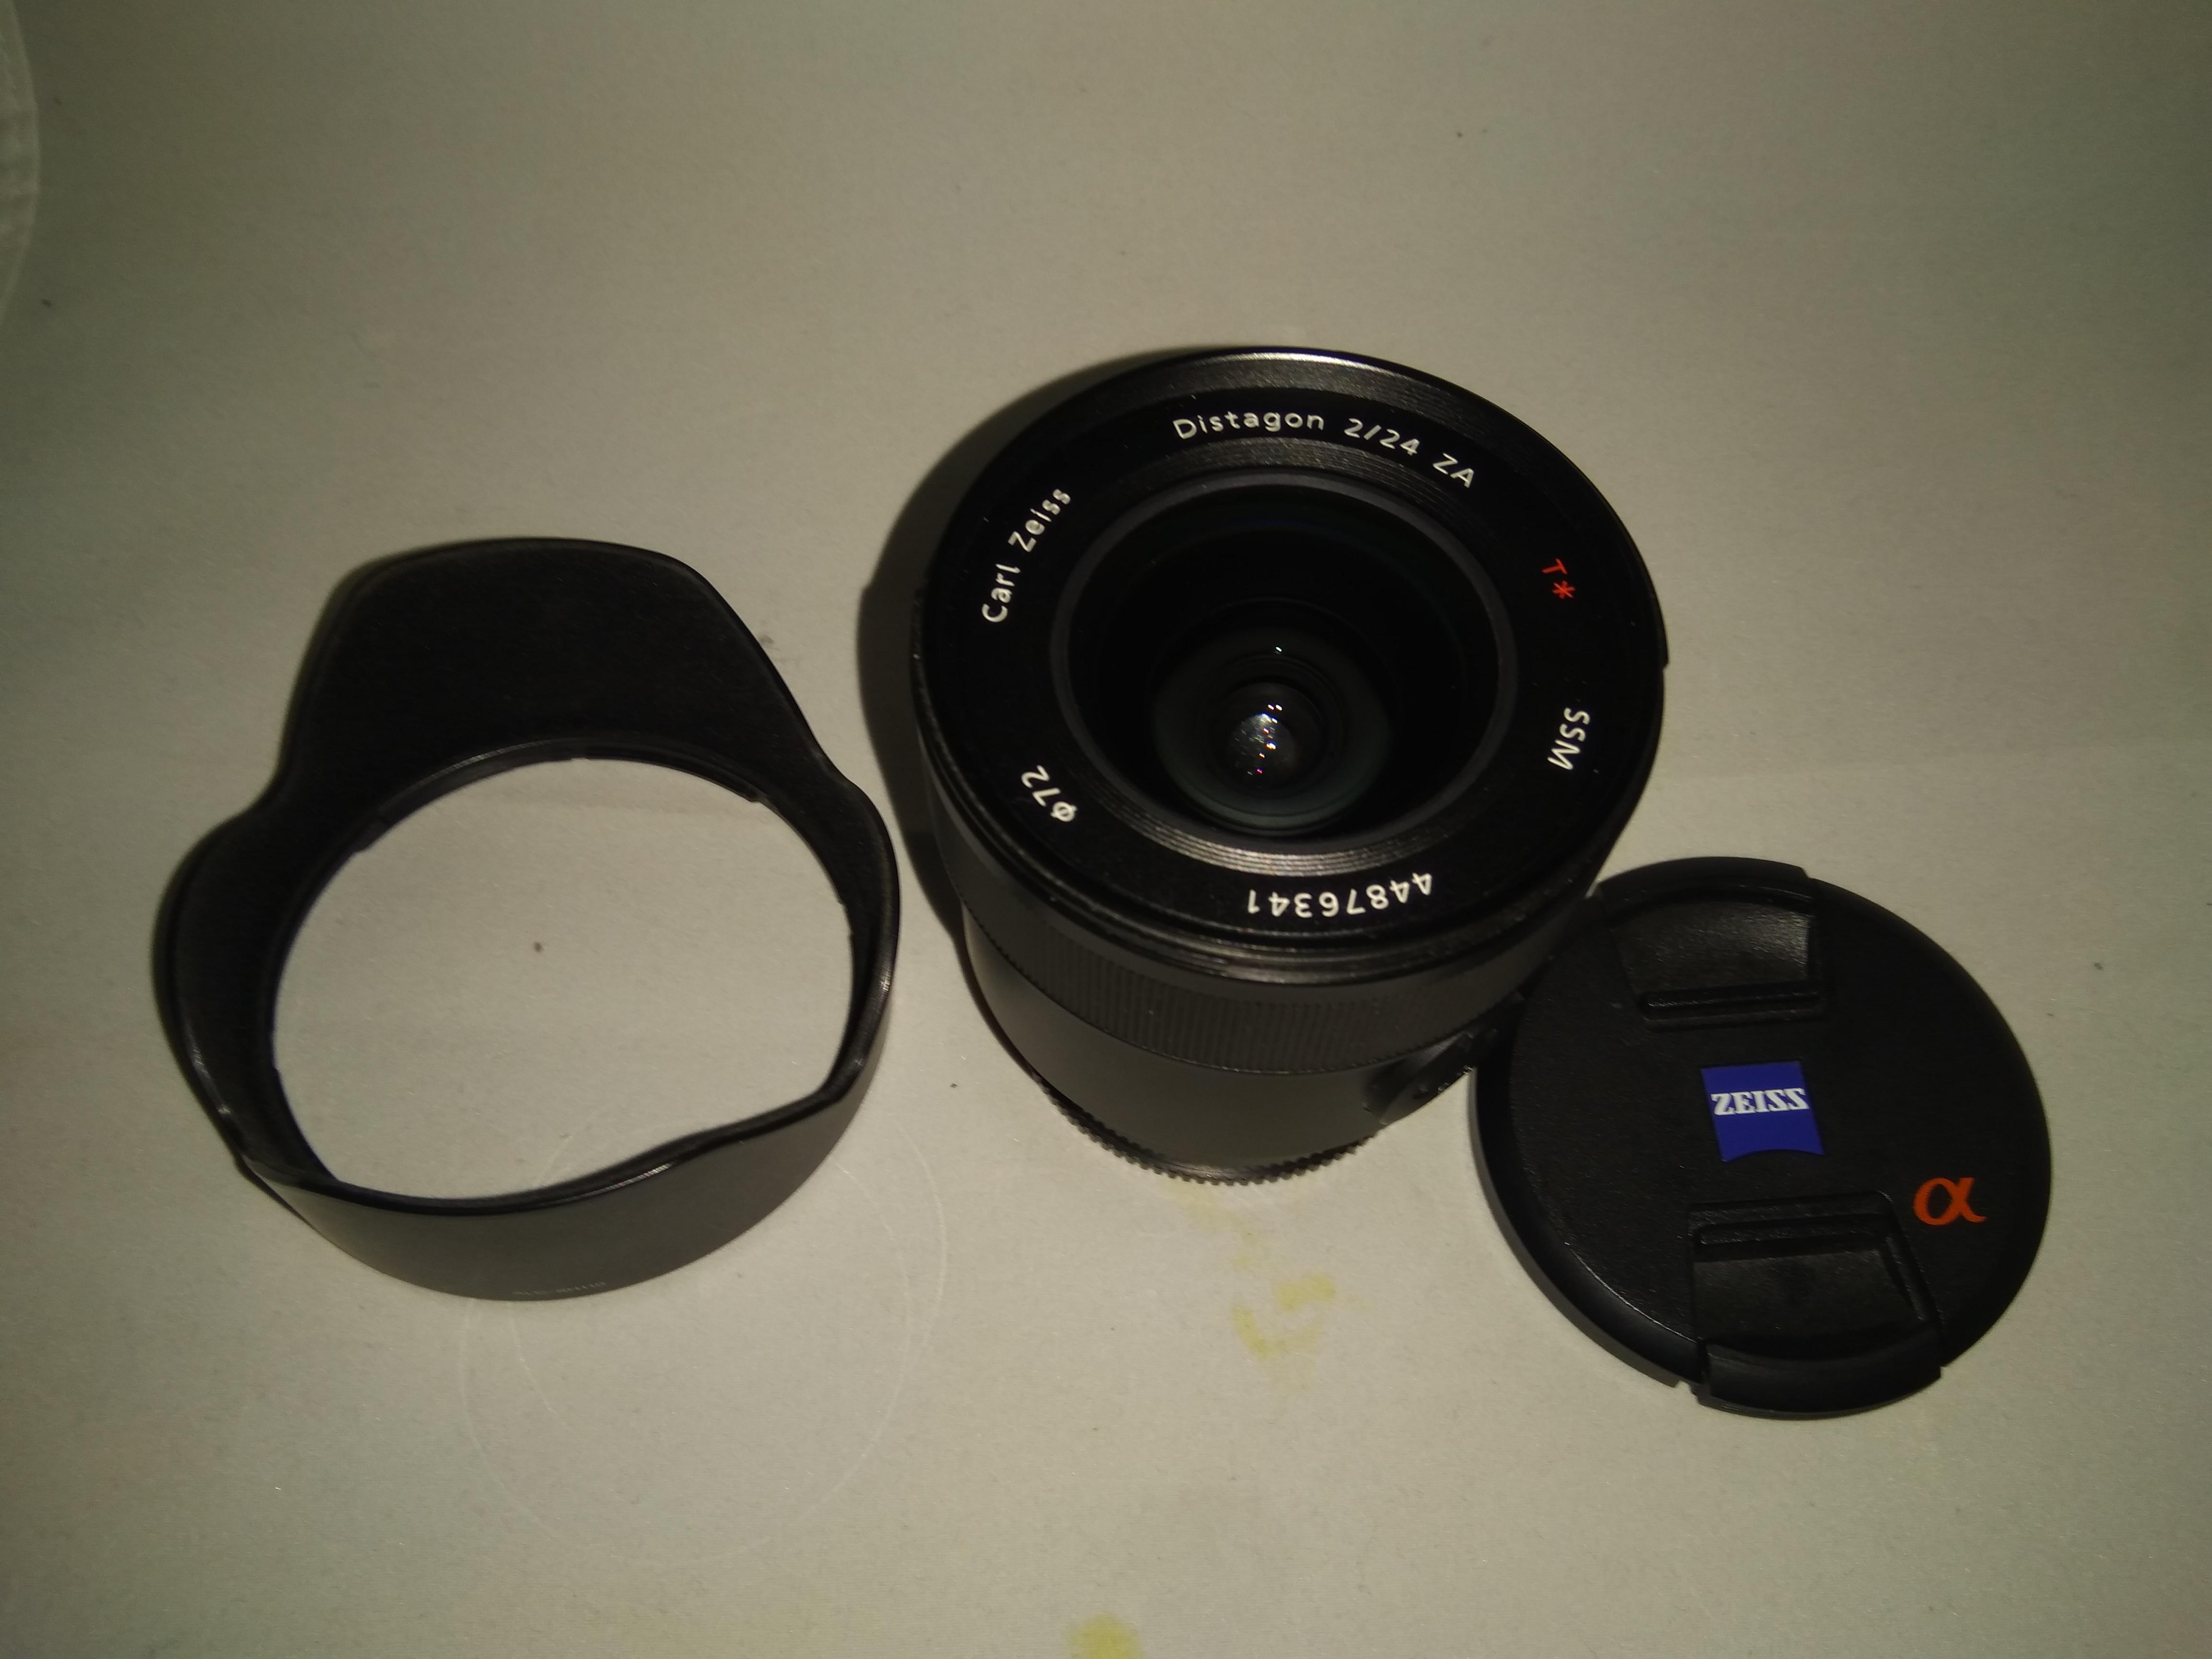 Ott Wyss Ag Fototechnik Canon Eos 6d Kit 24 105mm F 40l Is Usm Wifi And Gps Sony Zeiss Distagon T 24mm F2 Za Ssm